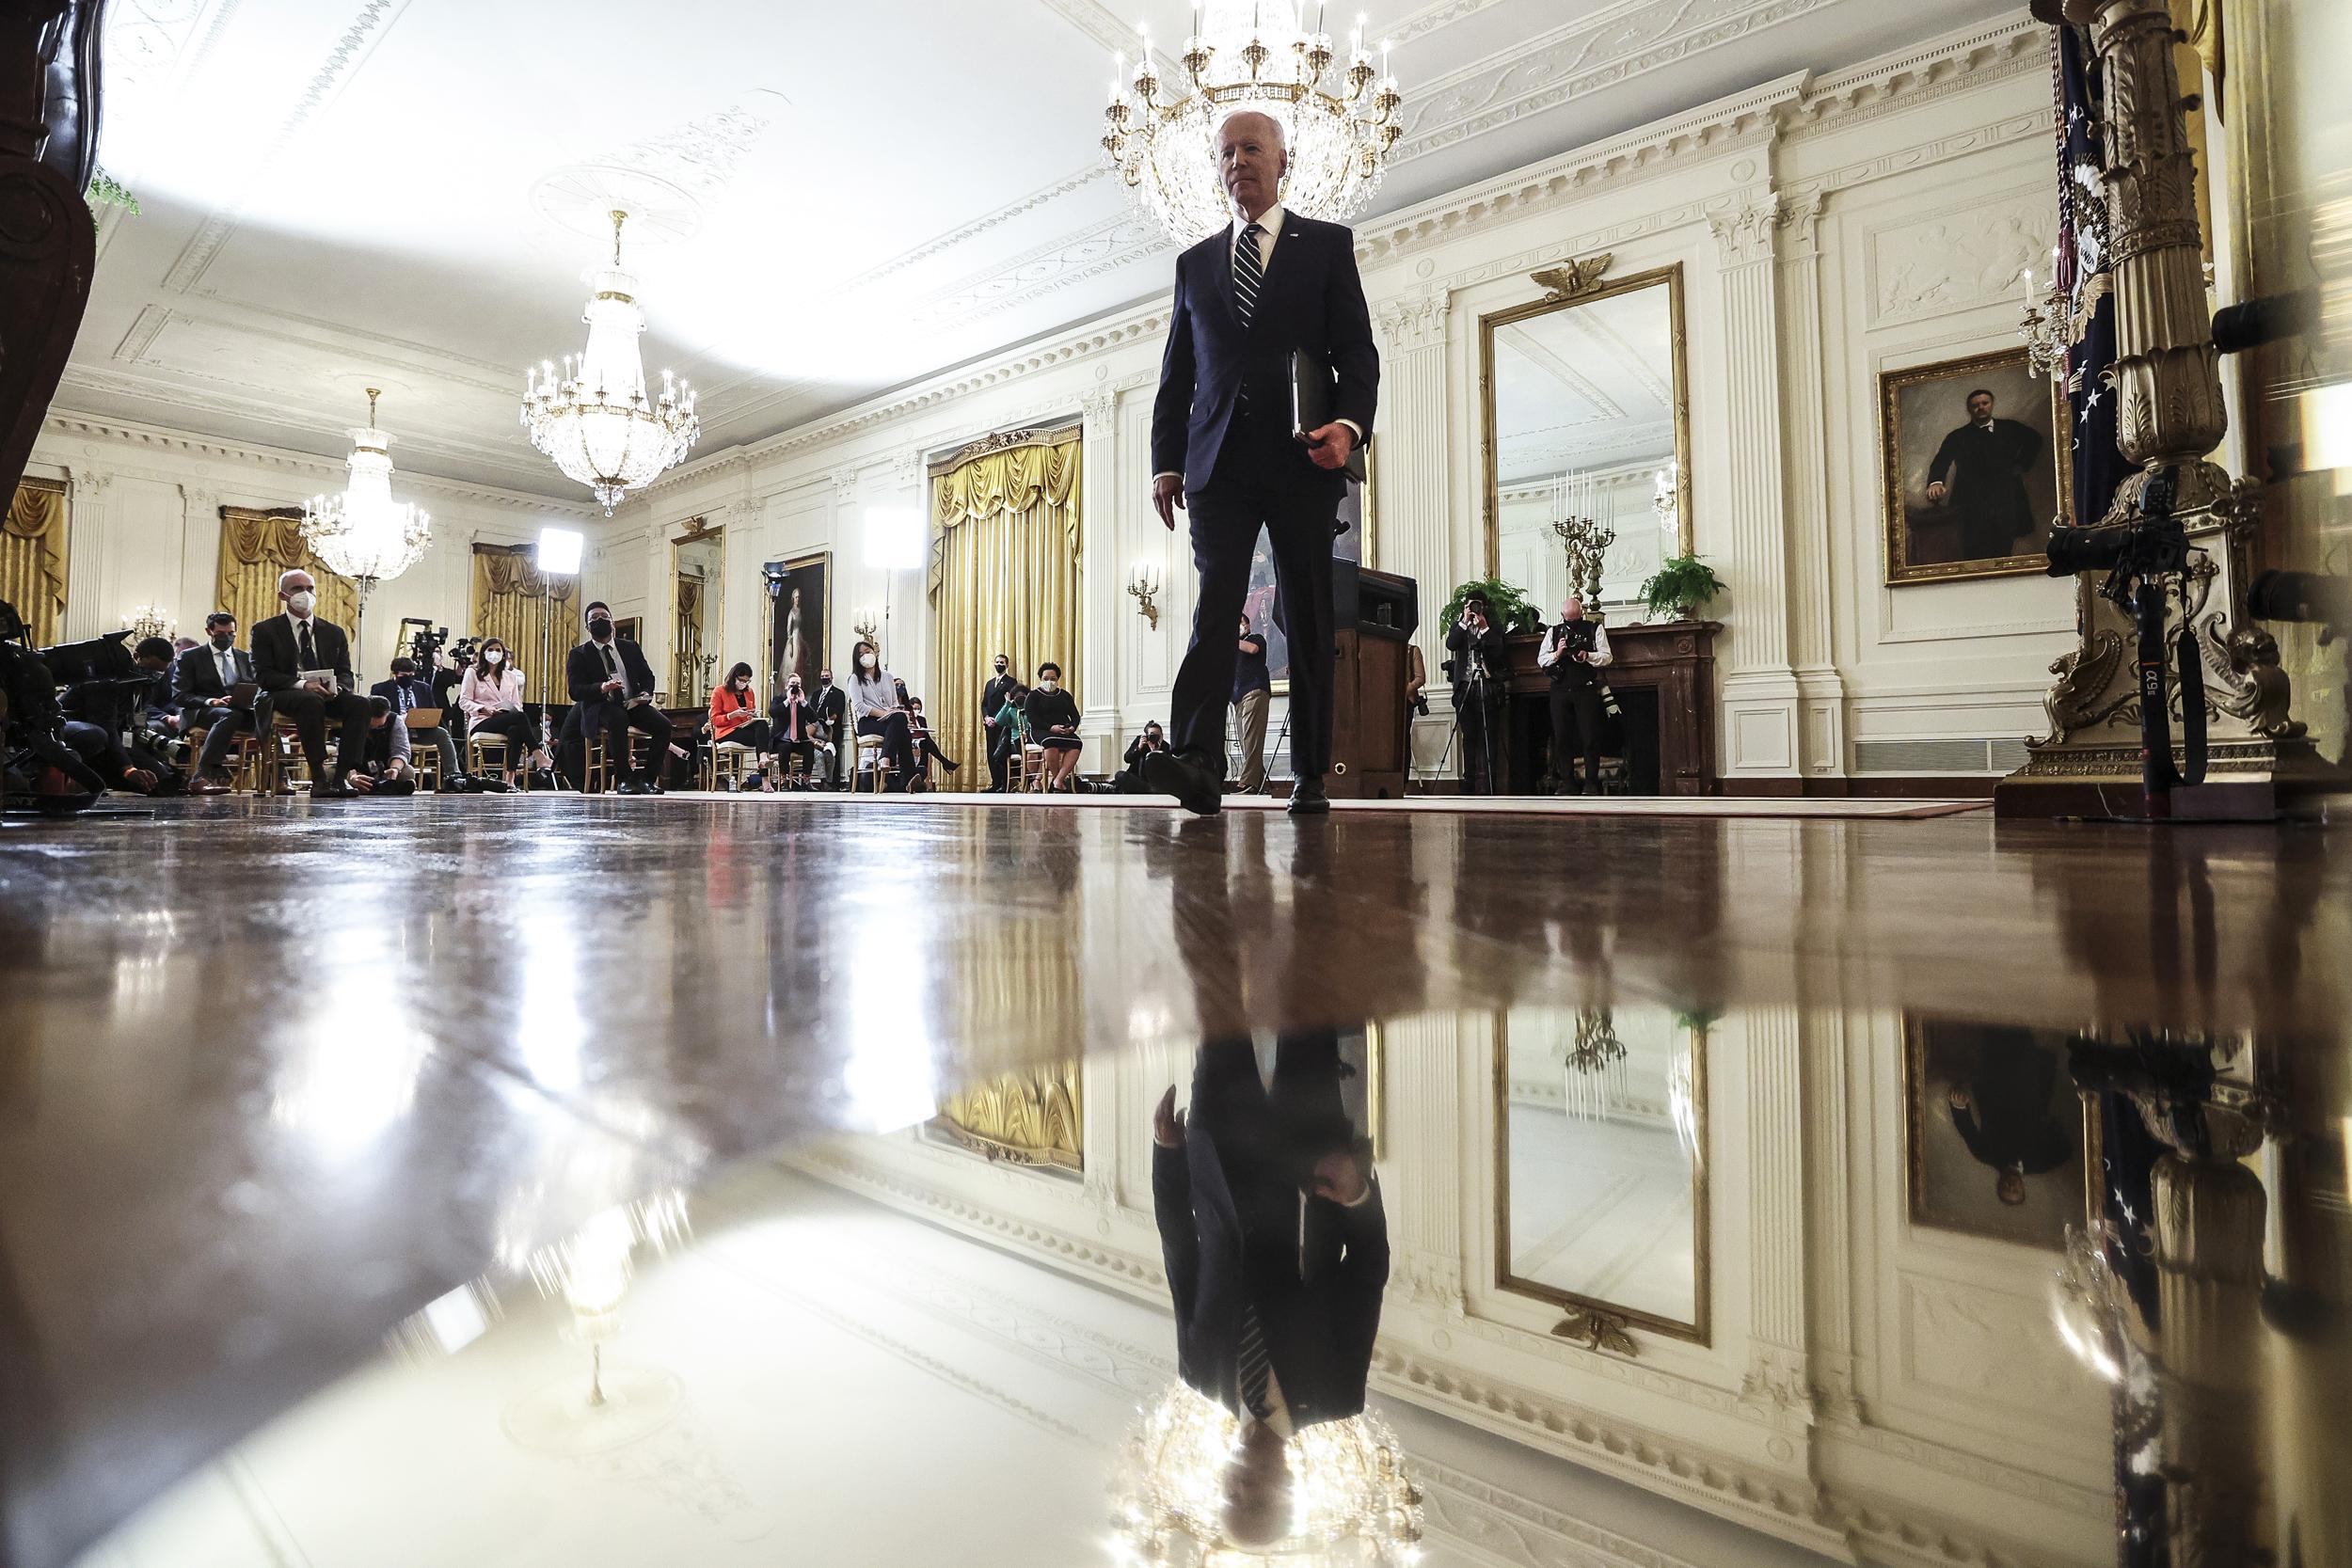 Biden's job ratings decline amid Covid surge, Afghanistan withdrawal in NBC News poll